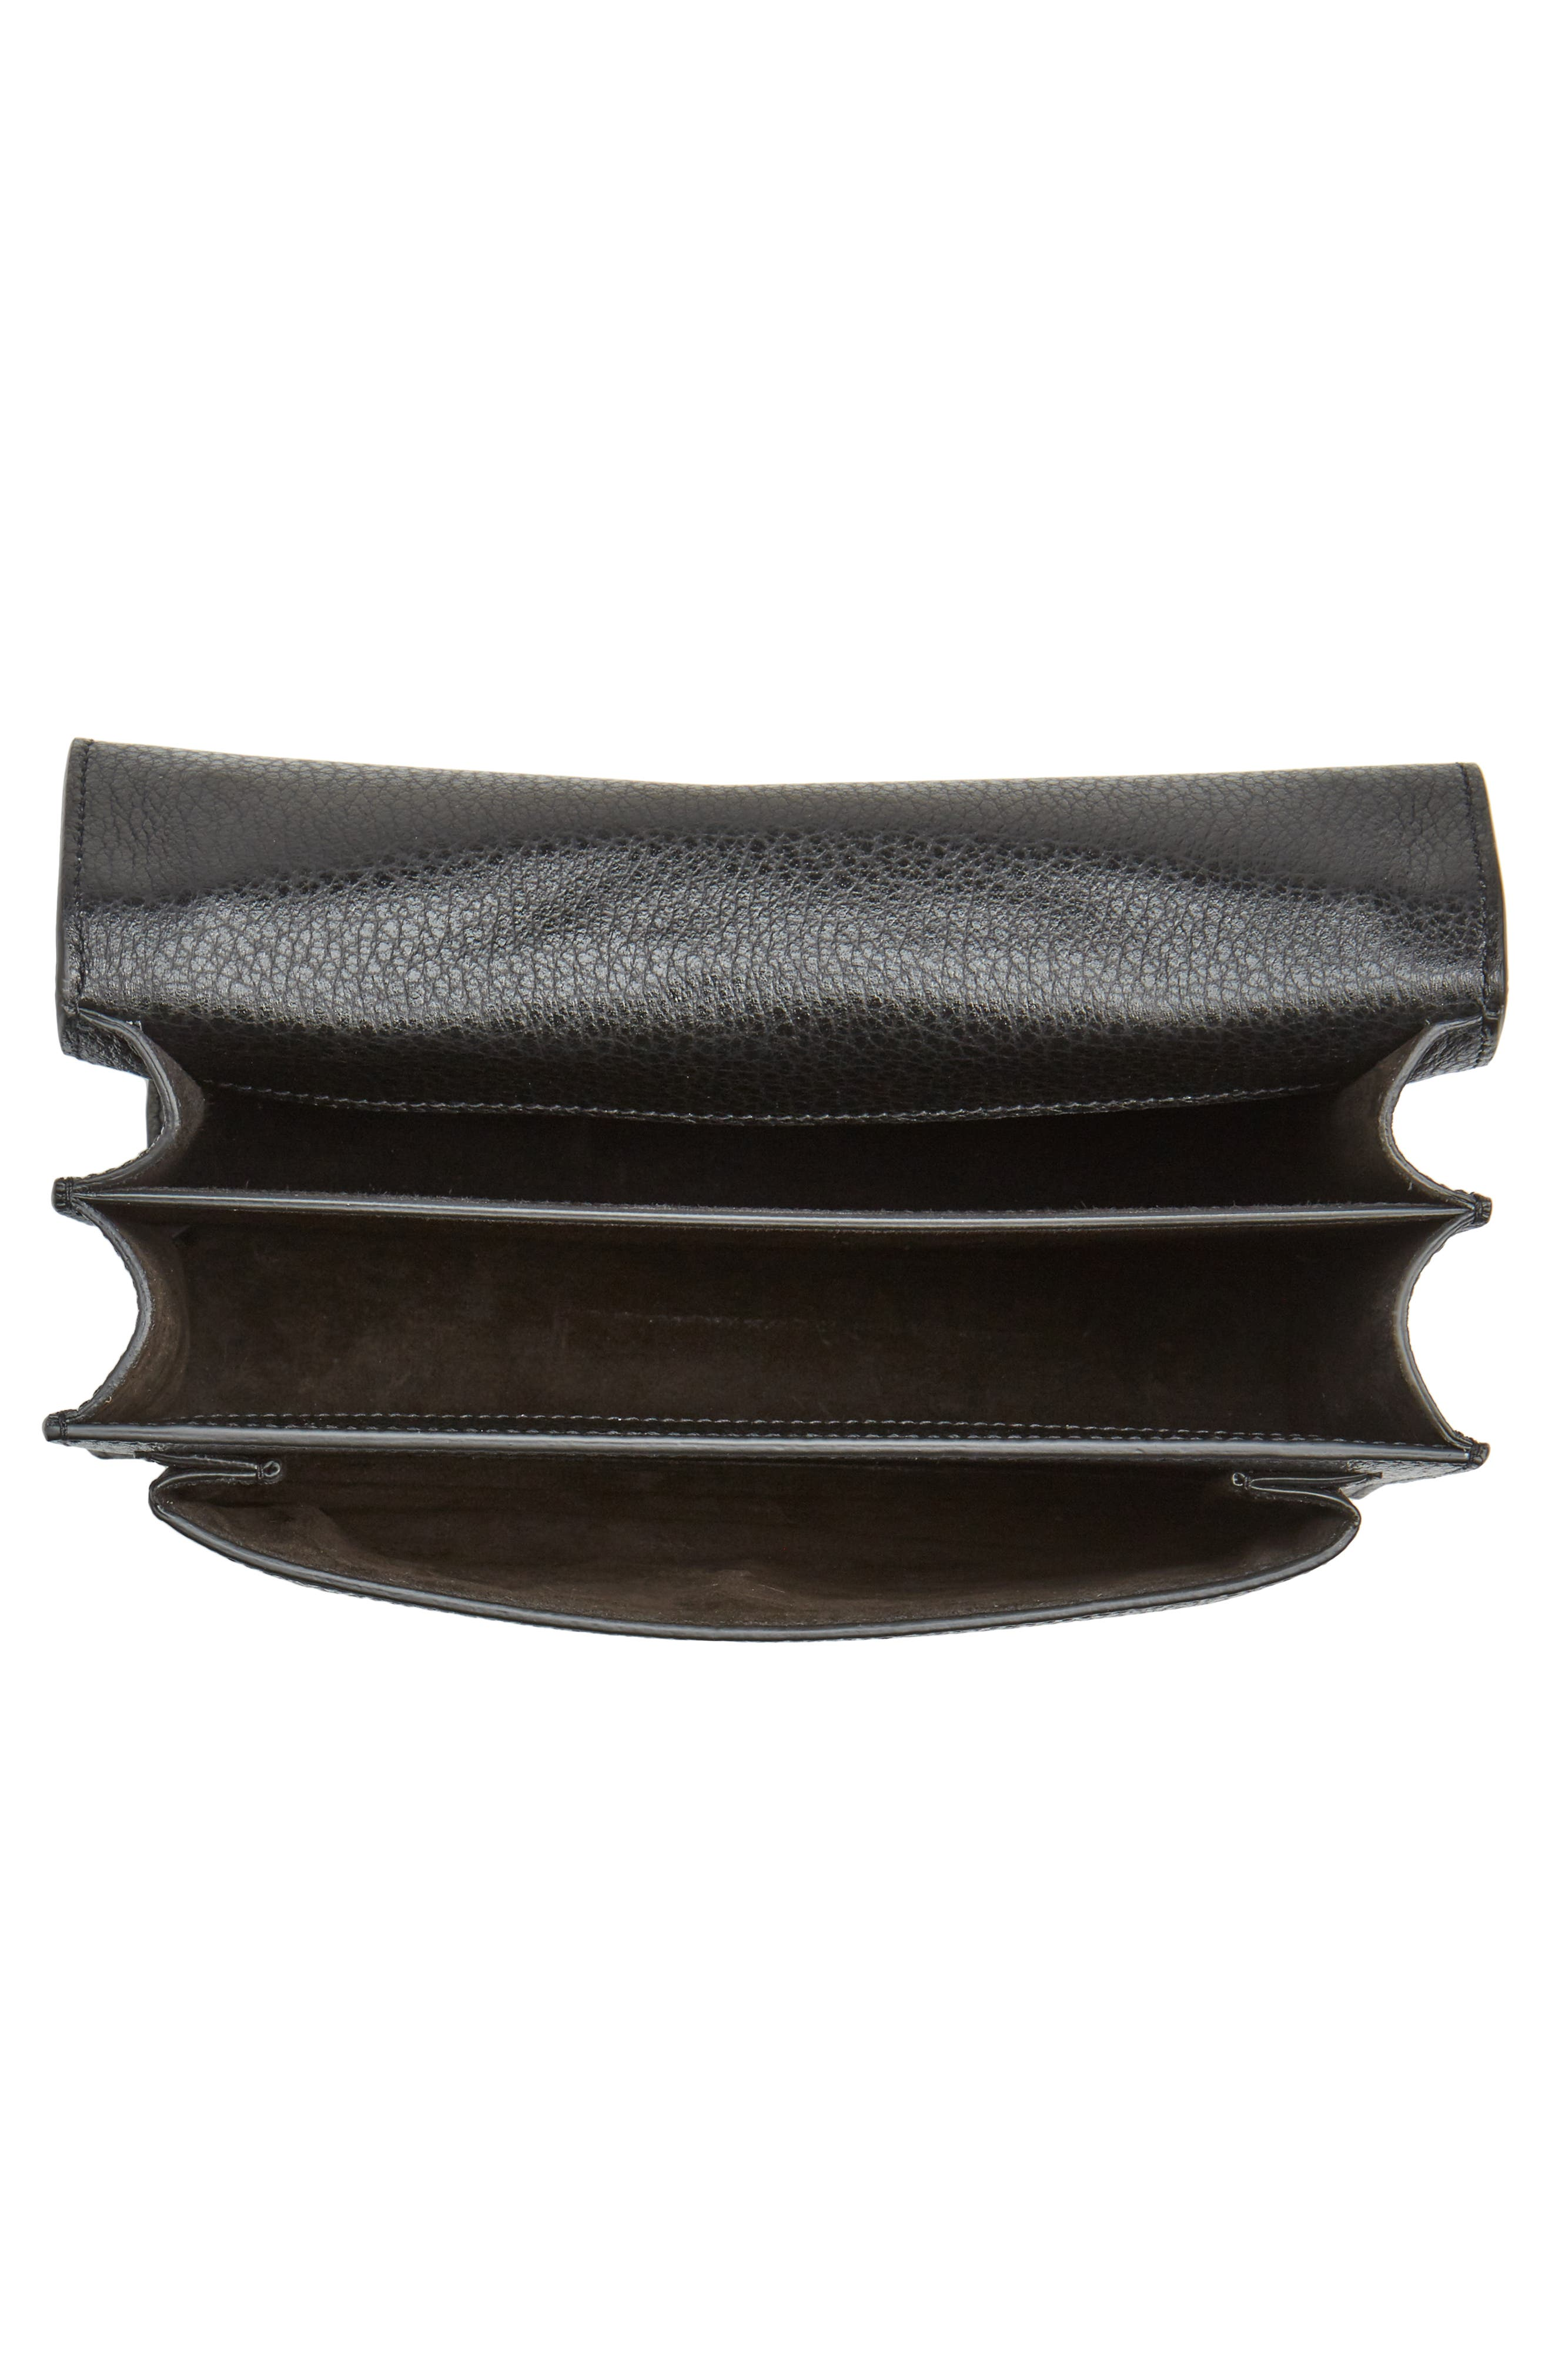 Medium Sunset Calfskin Shoulder Bag with Woven Guitar Strap,                             Alternate thumbnail 4, color,                             001